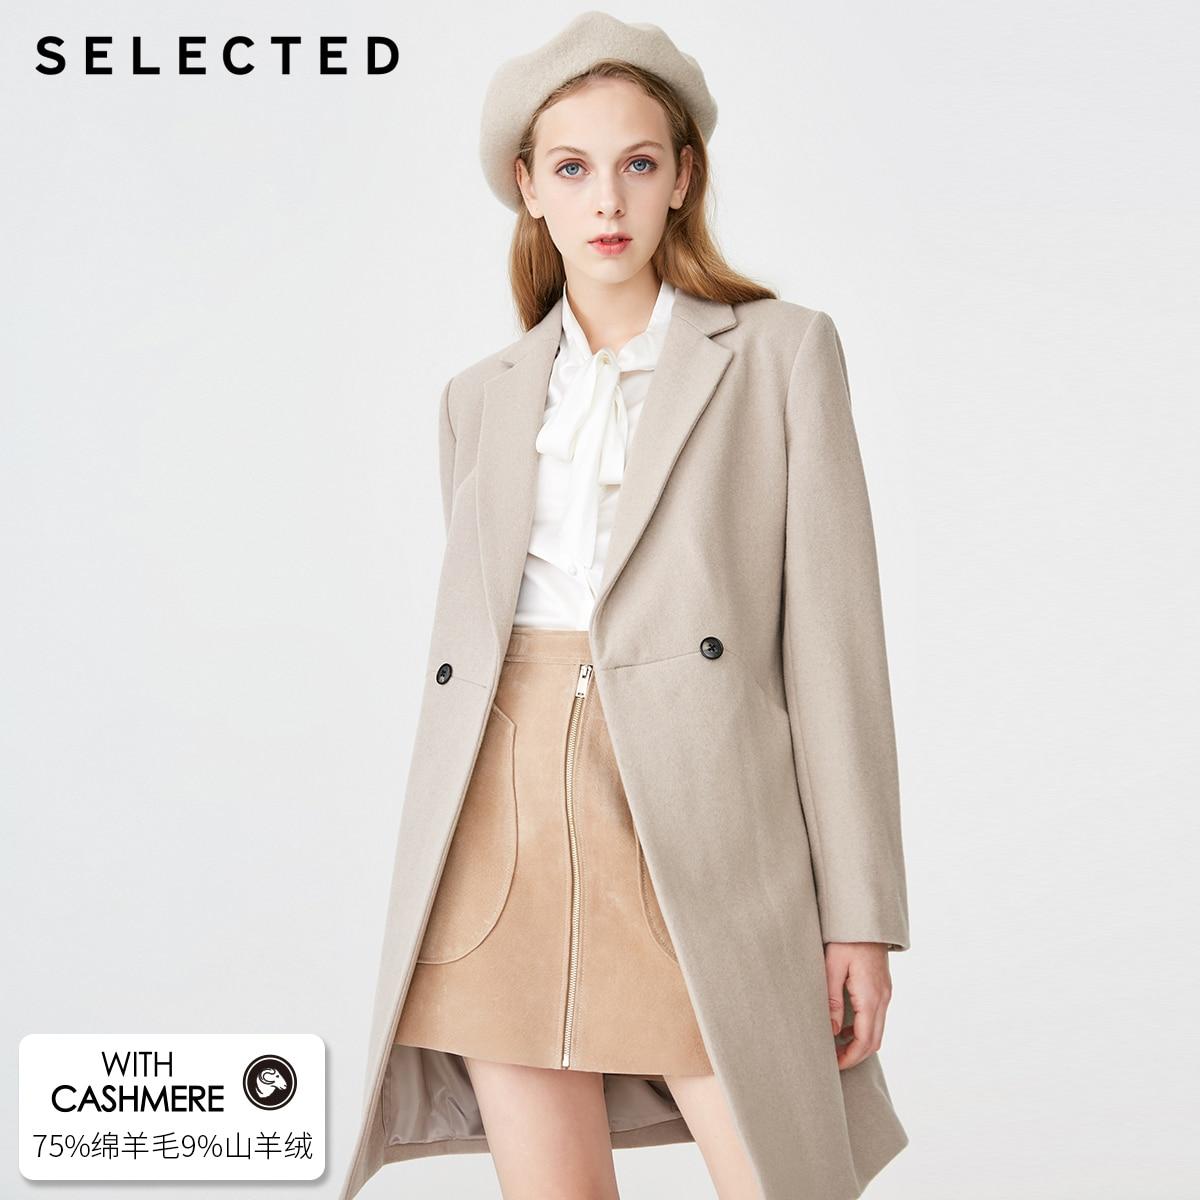 SELECTED Women's Mid-length Pure Color Woolen Overcoat SIG|419127506